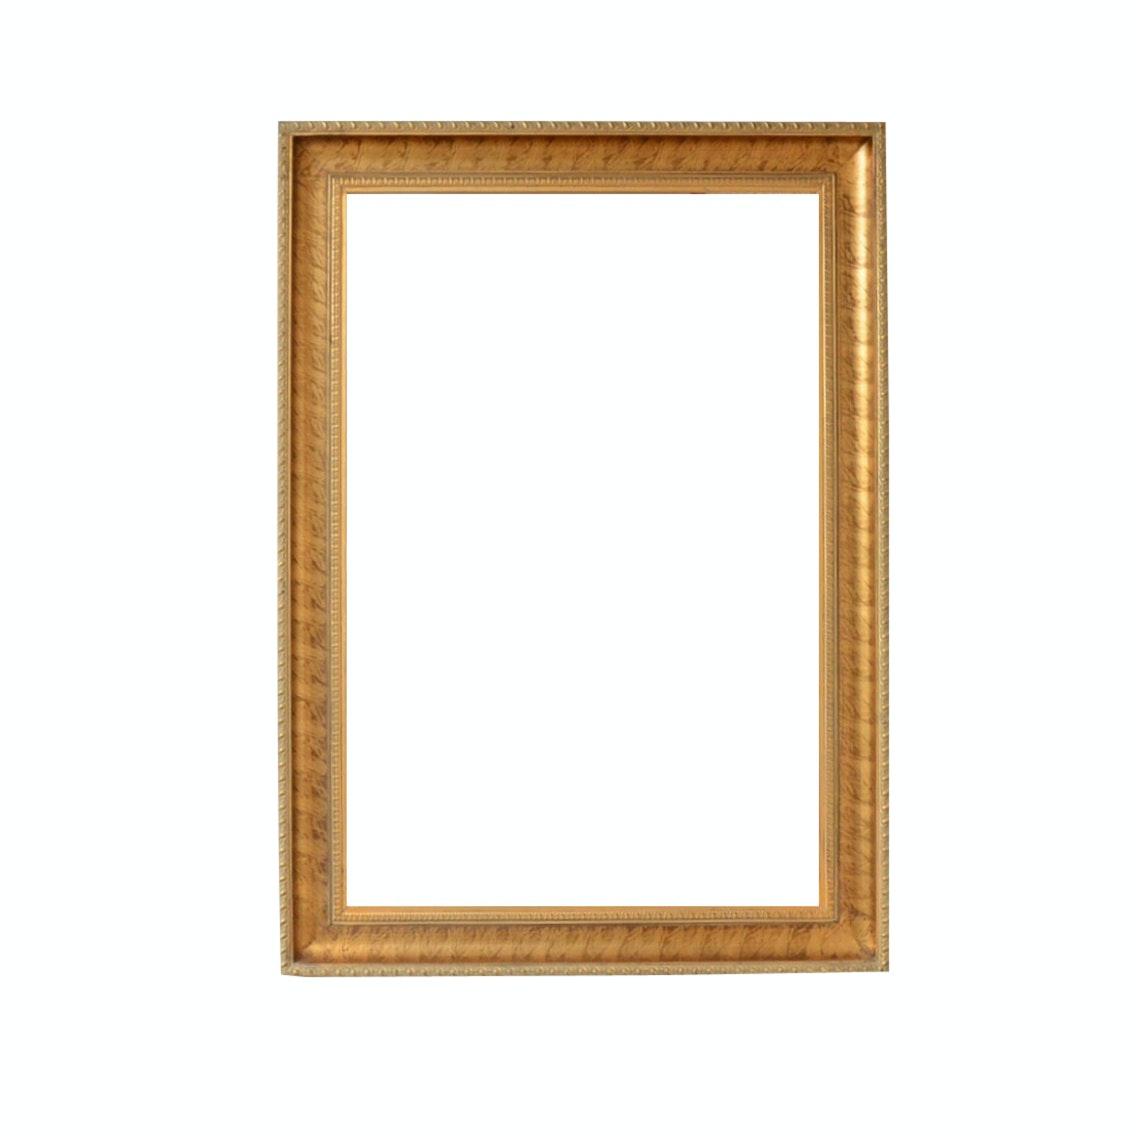 Gold-Tone Beveled Wall Mirror